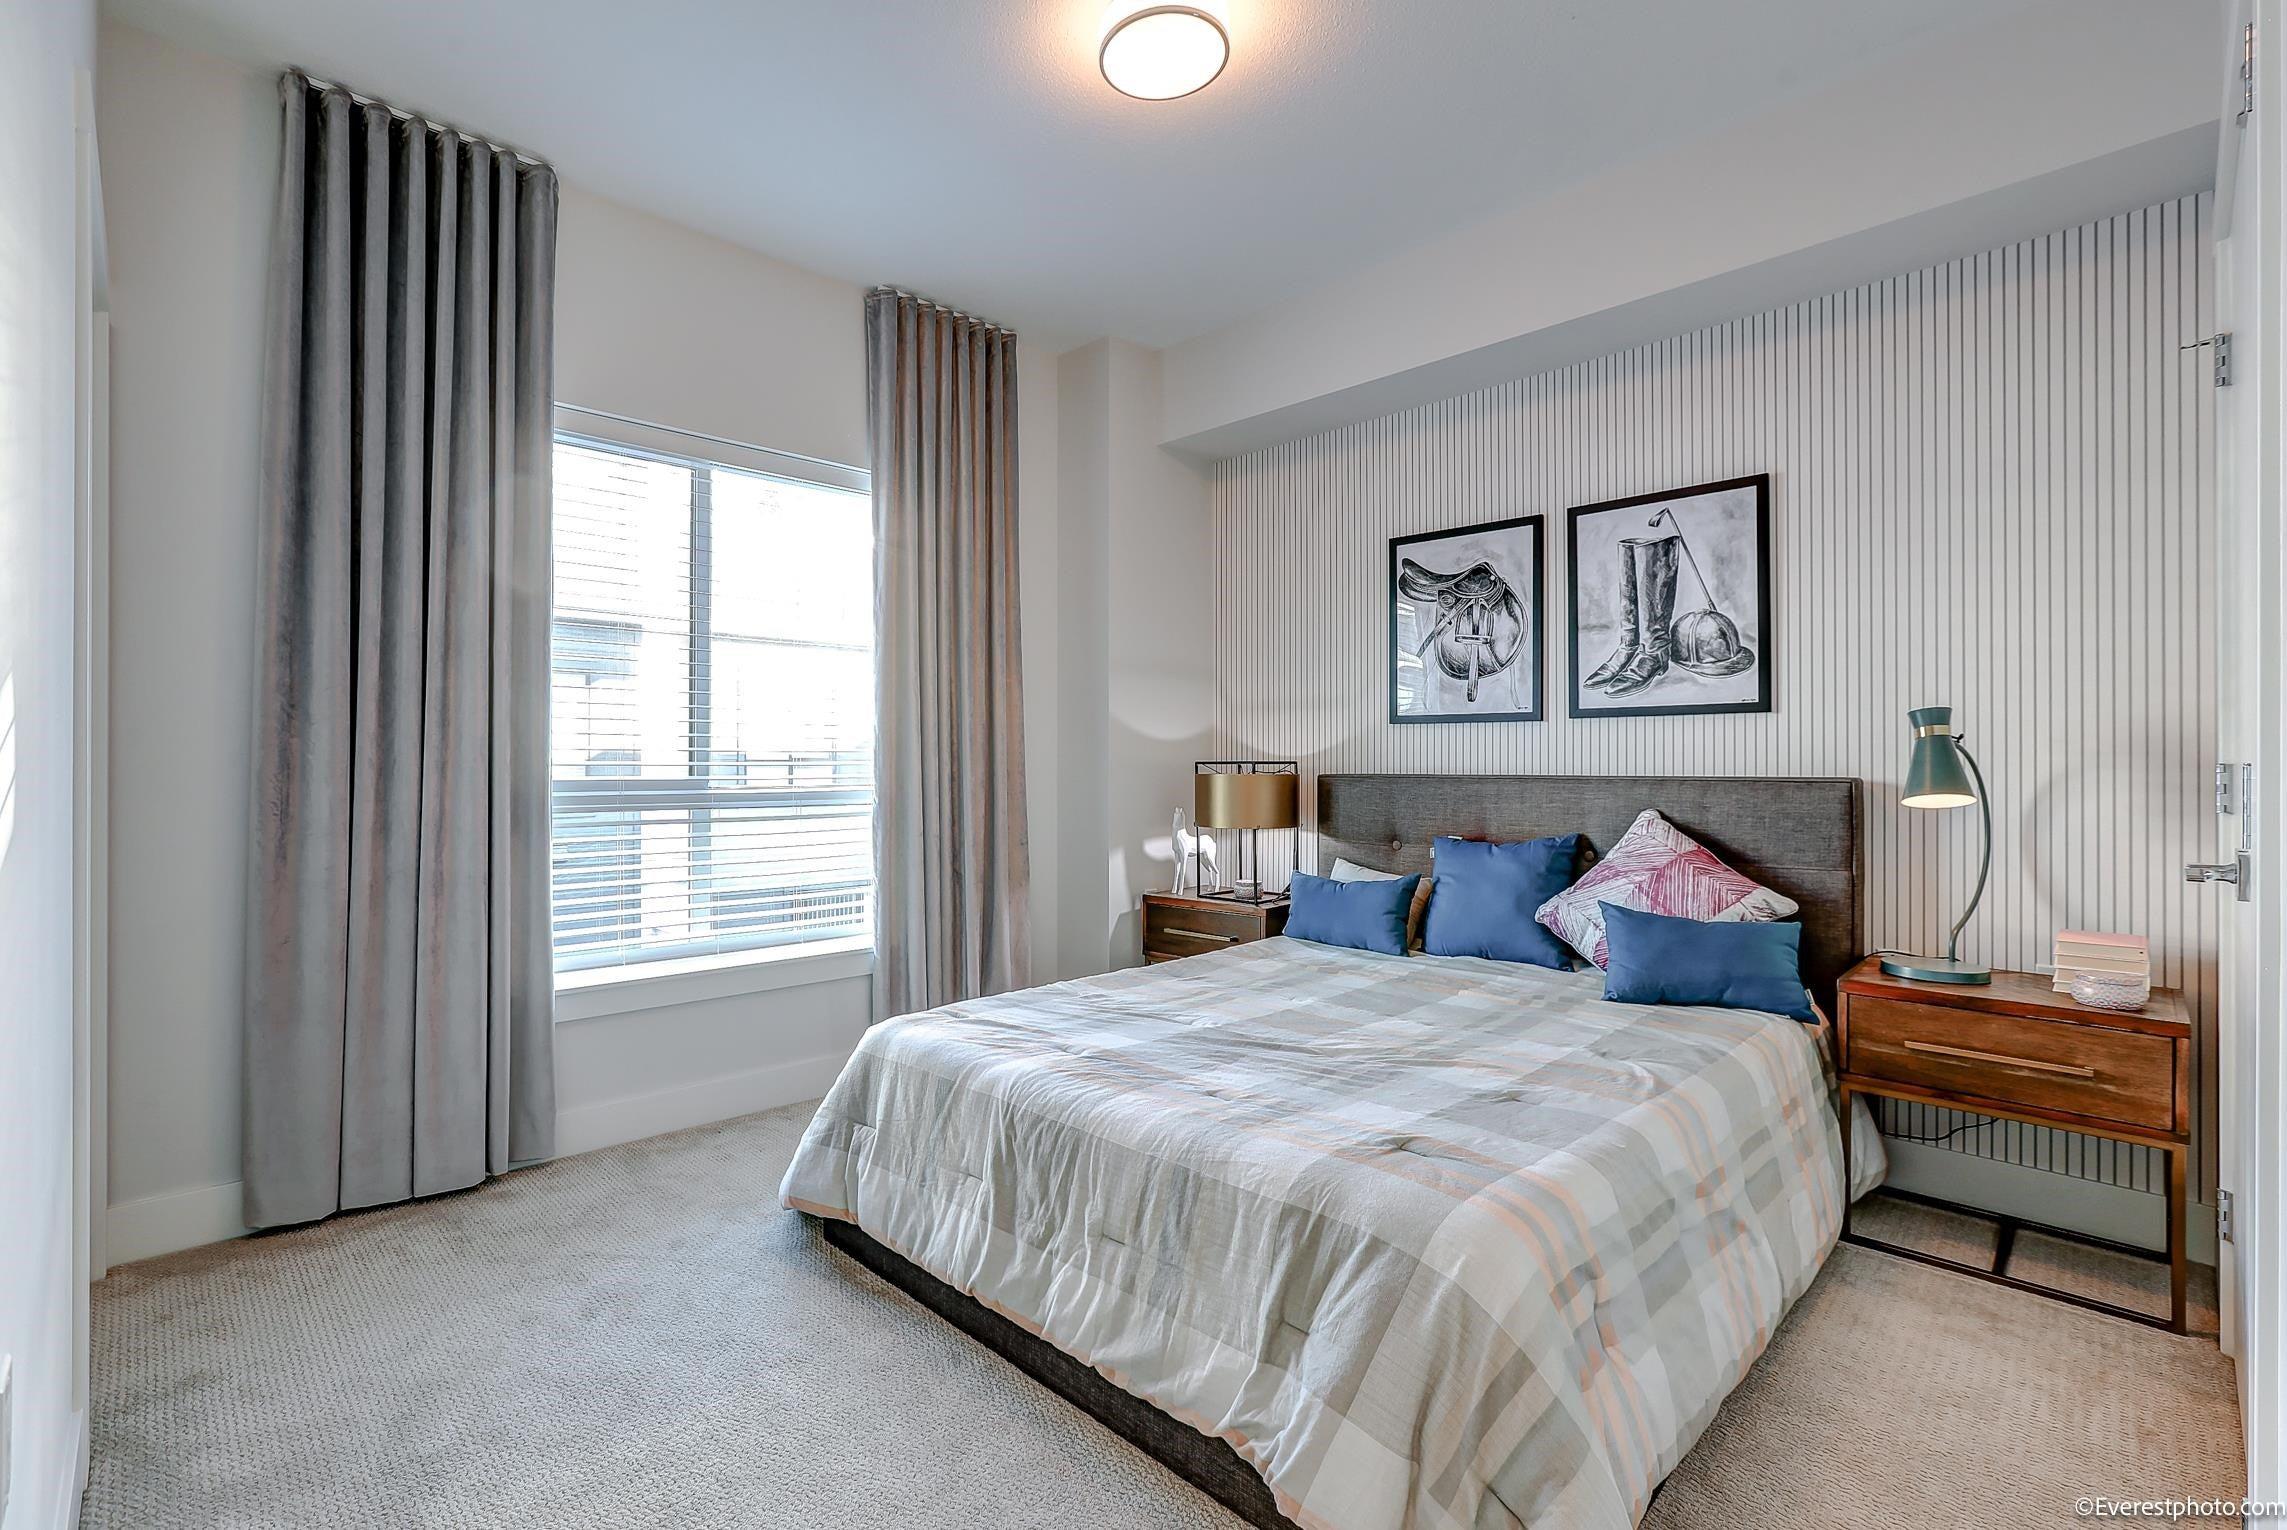 186 2277 OAK MEADOWS DRIVE - Grandview Surrey Townhouse for sale, 3 Bedrooms (R2624950) - #31